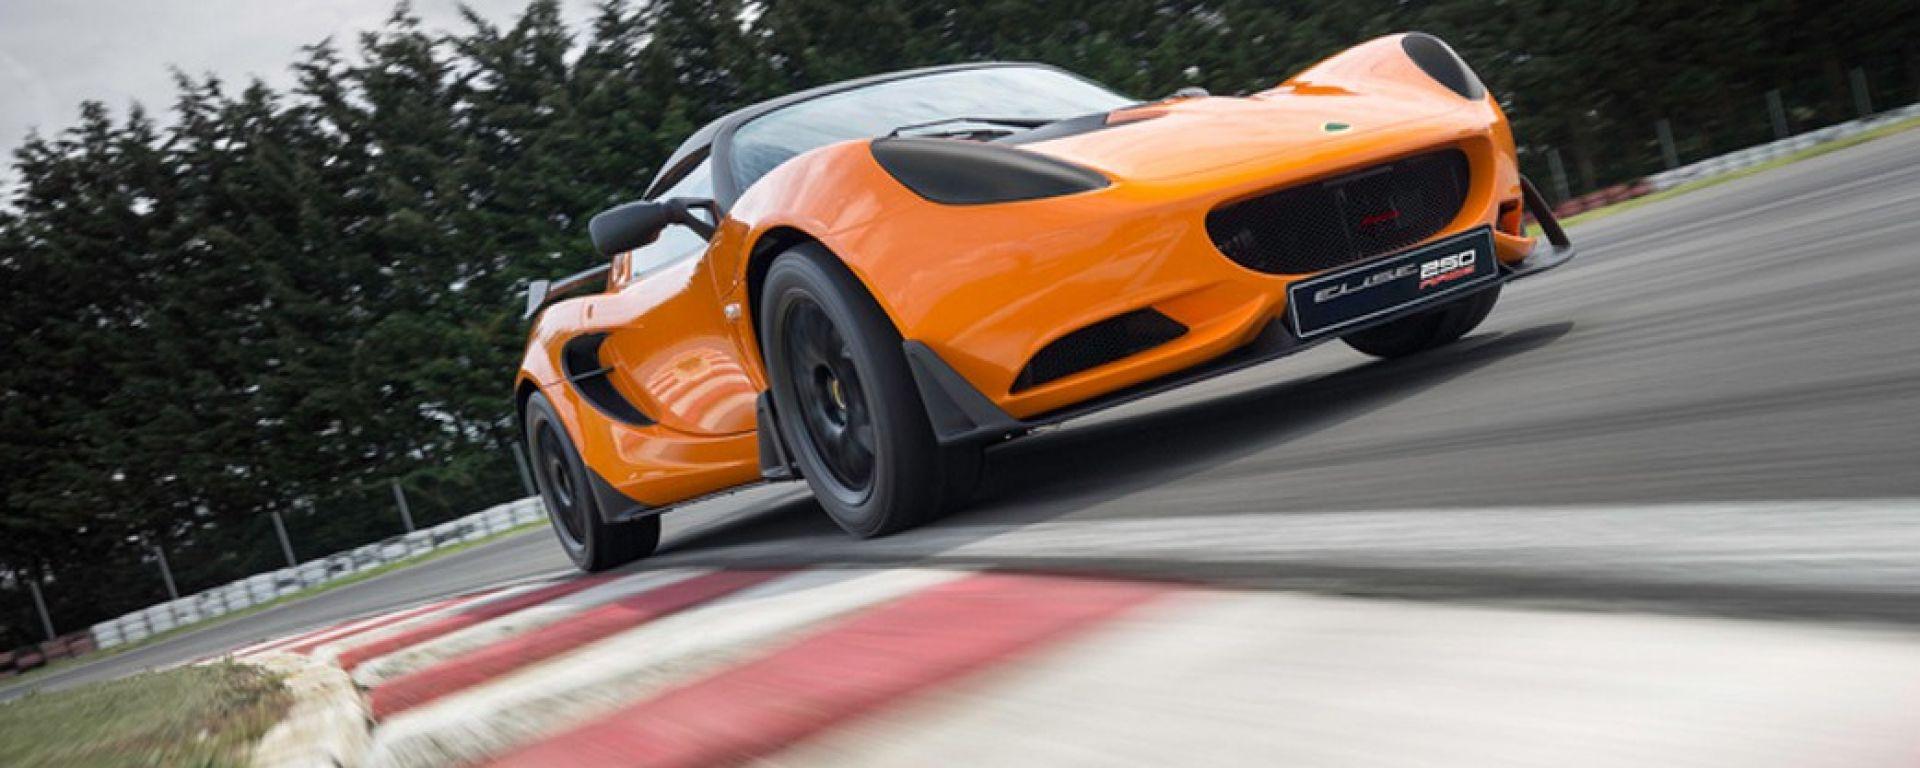 Lotus Elise Race 250: sportiva pronto gara